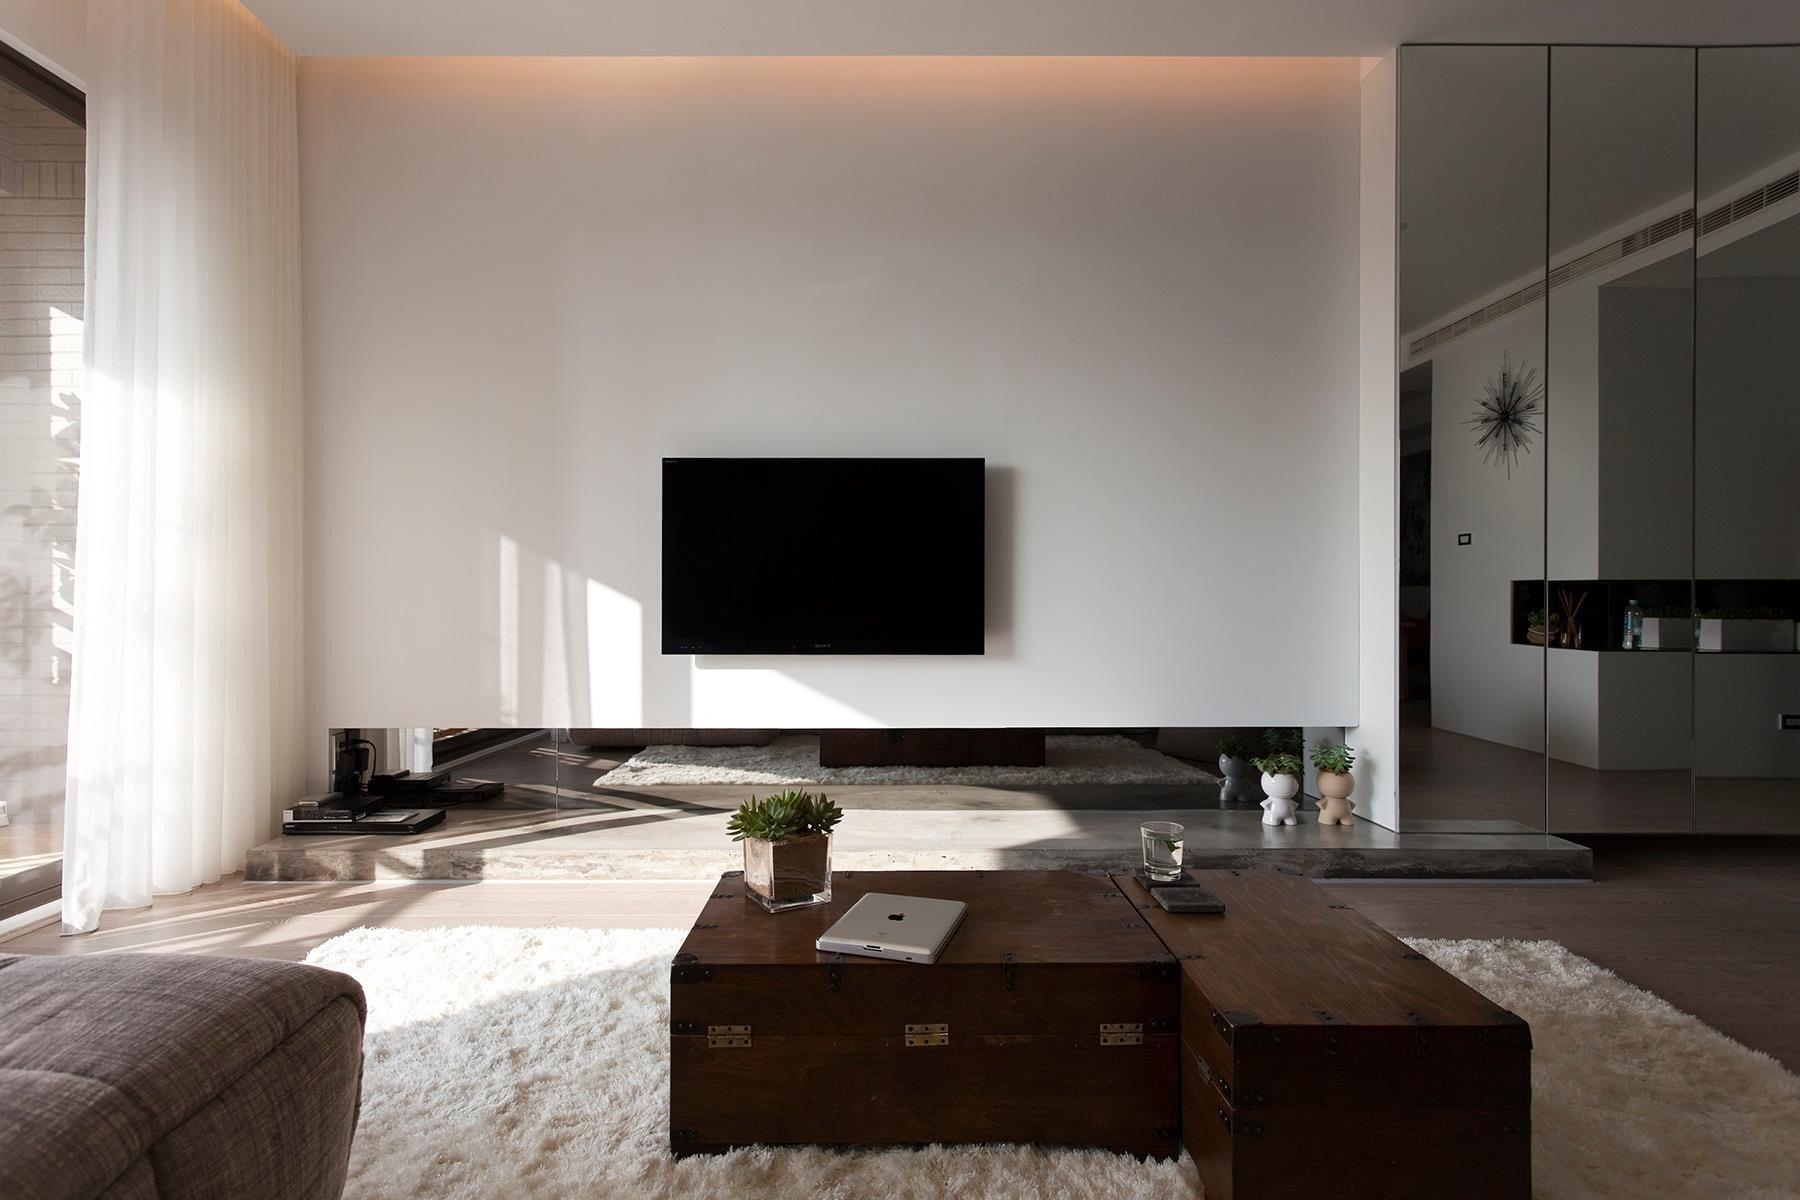 Modern Living Room Wall Decor Inspirational 30 Modern Home Decor Ideas – the Wow Style